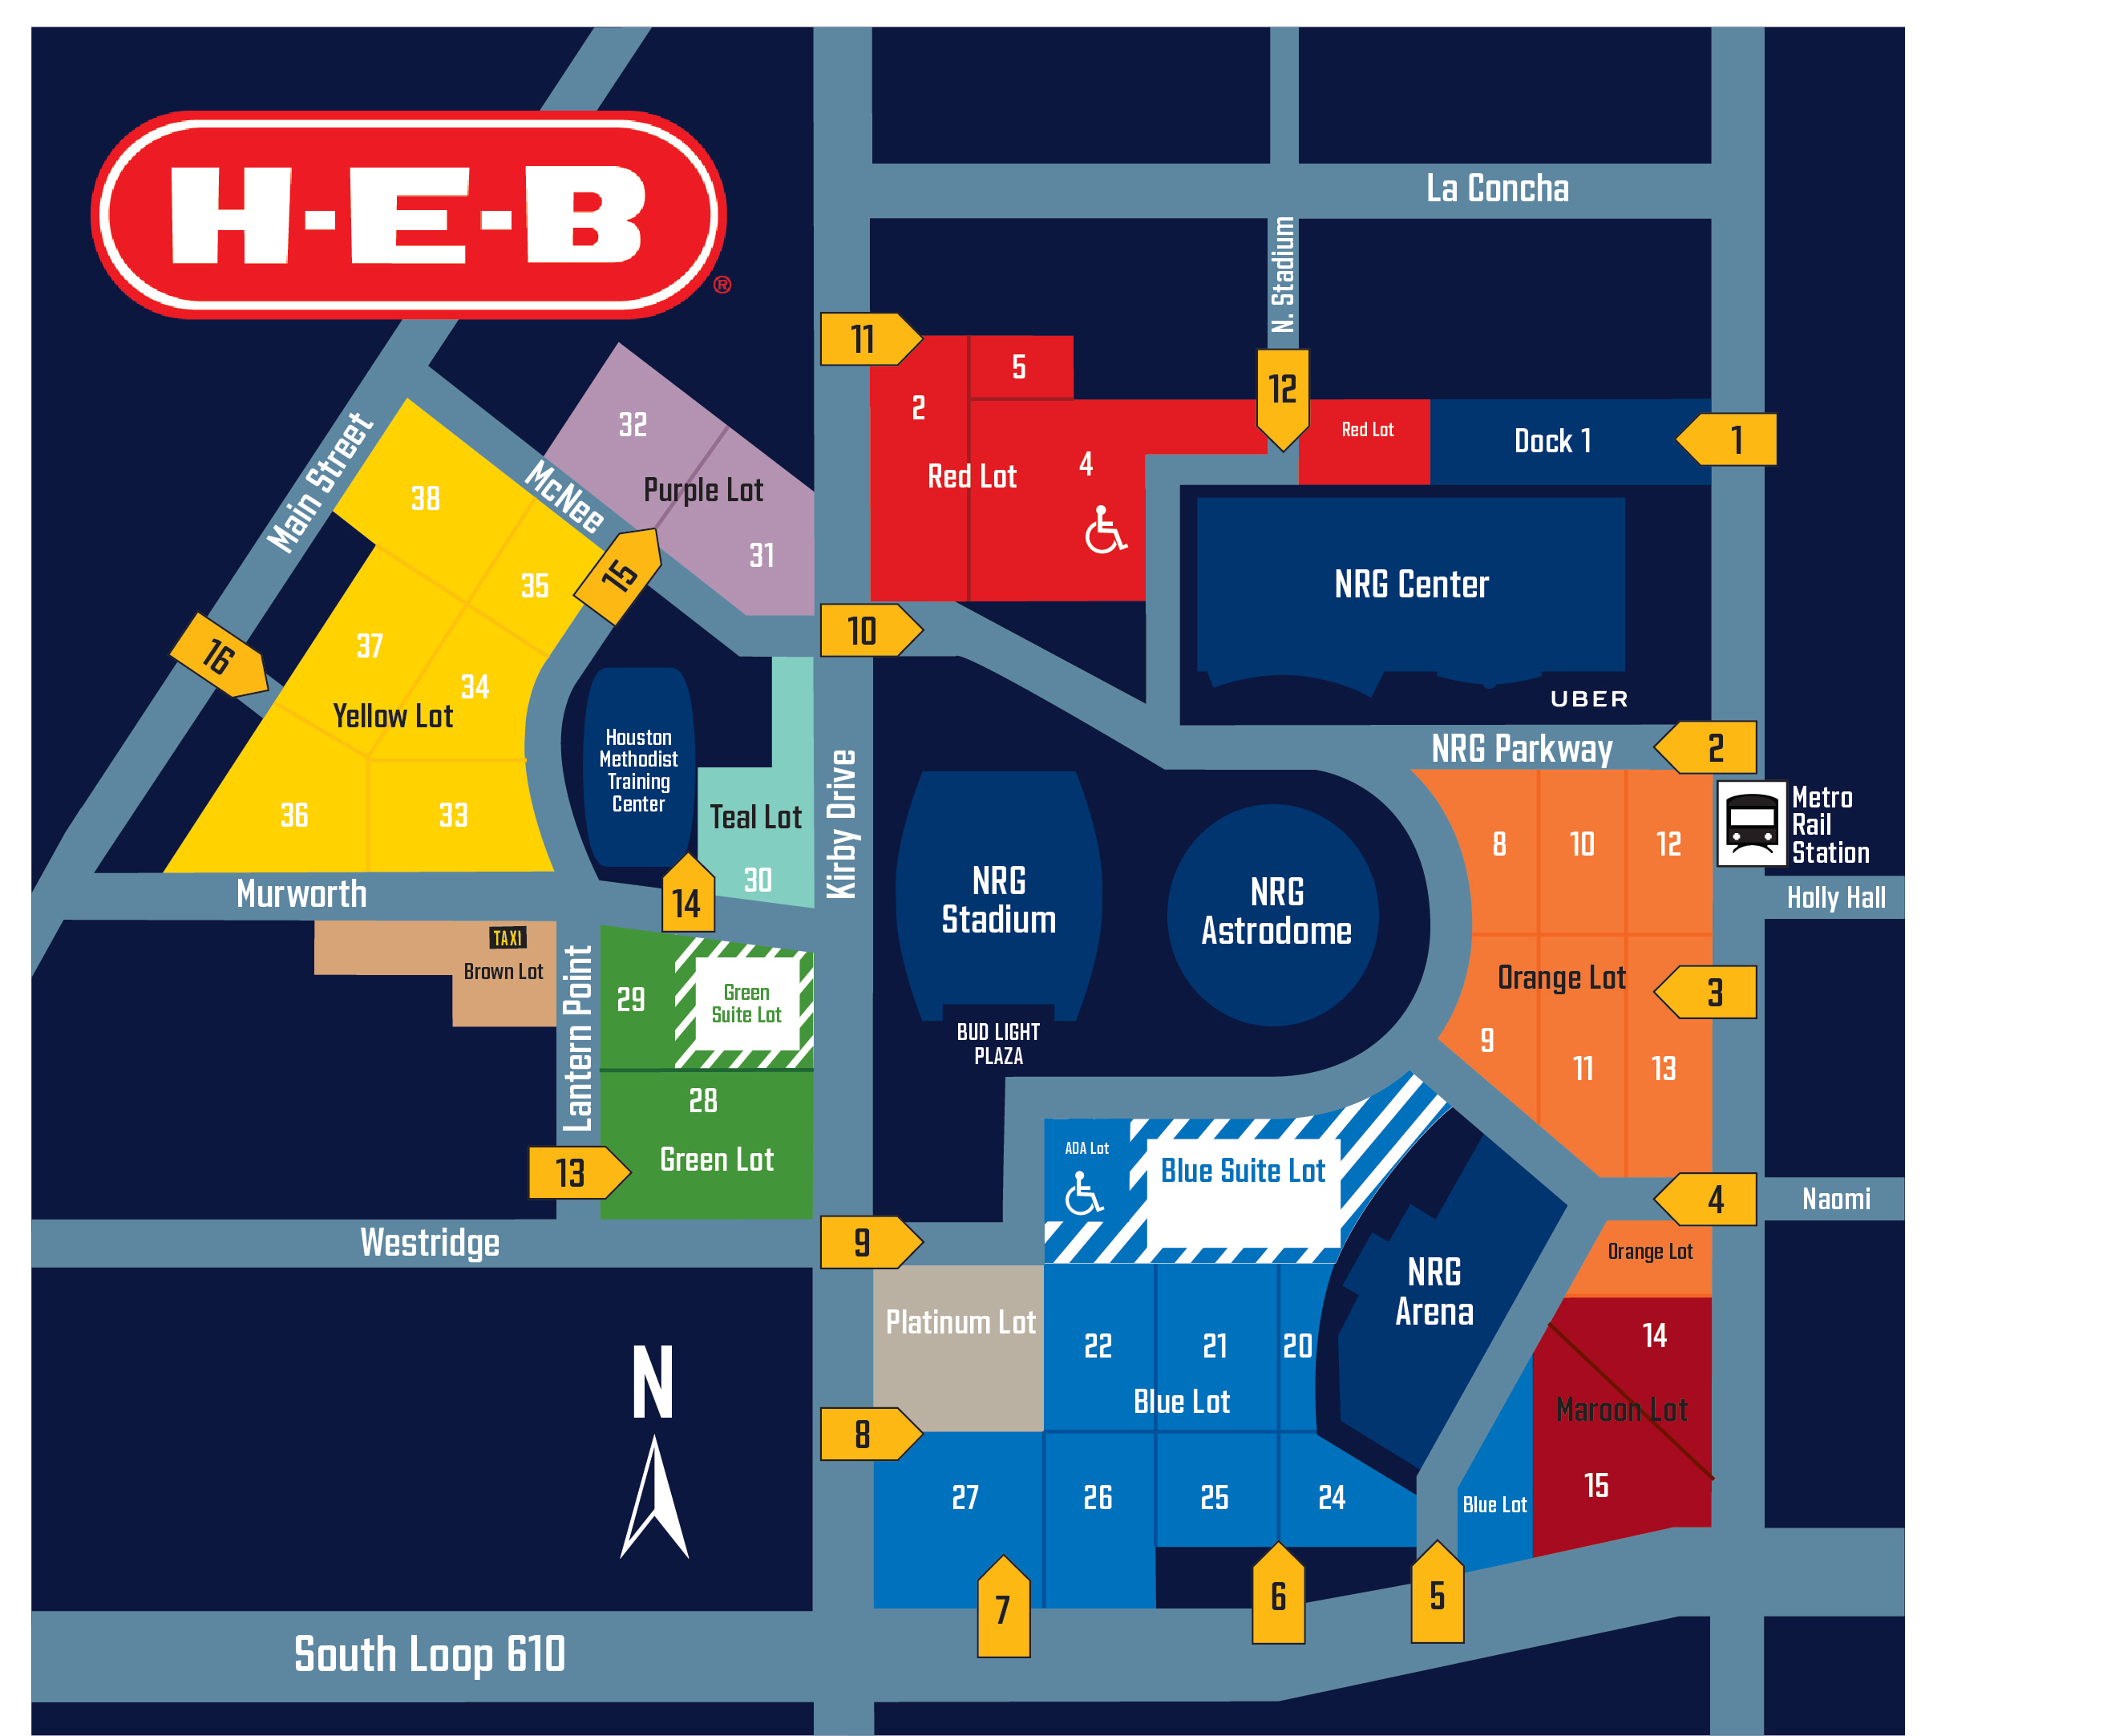 Parking | Houston Texans - HoustonTexans.com